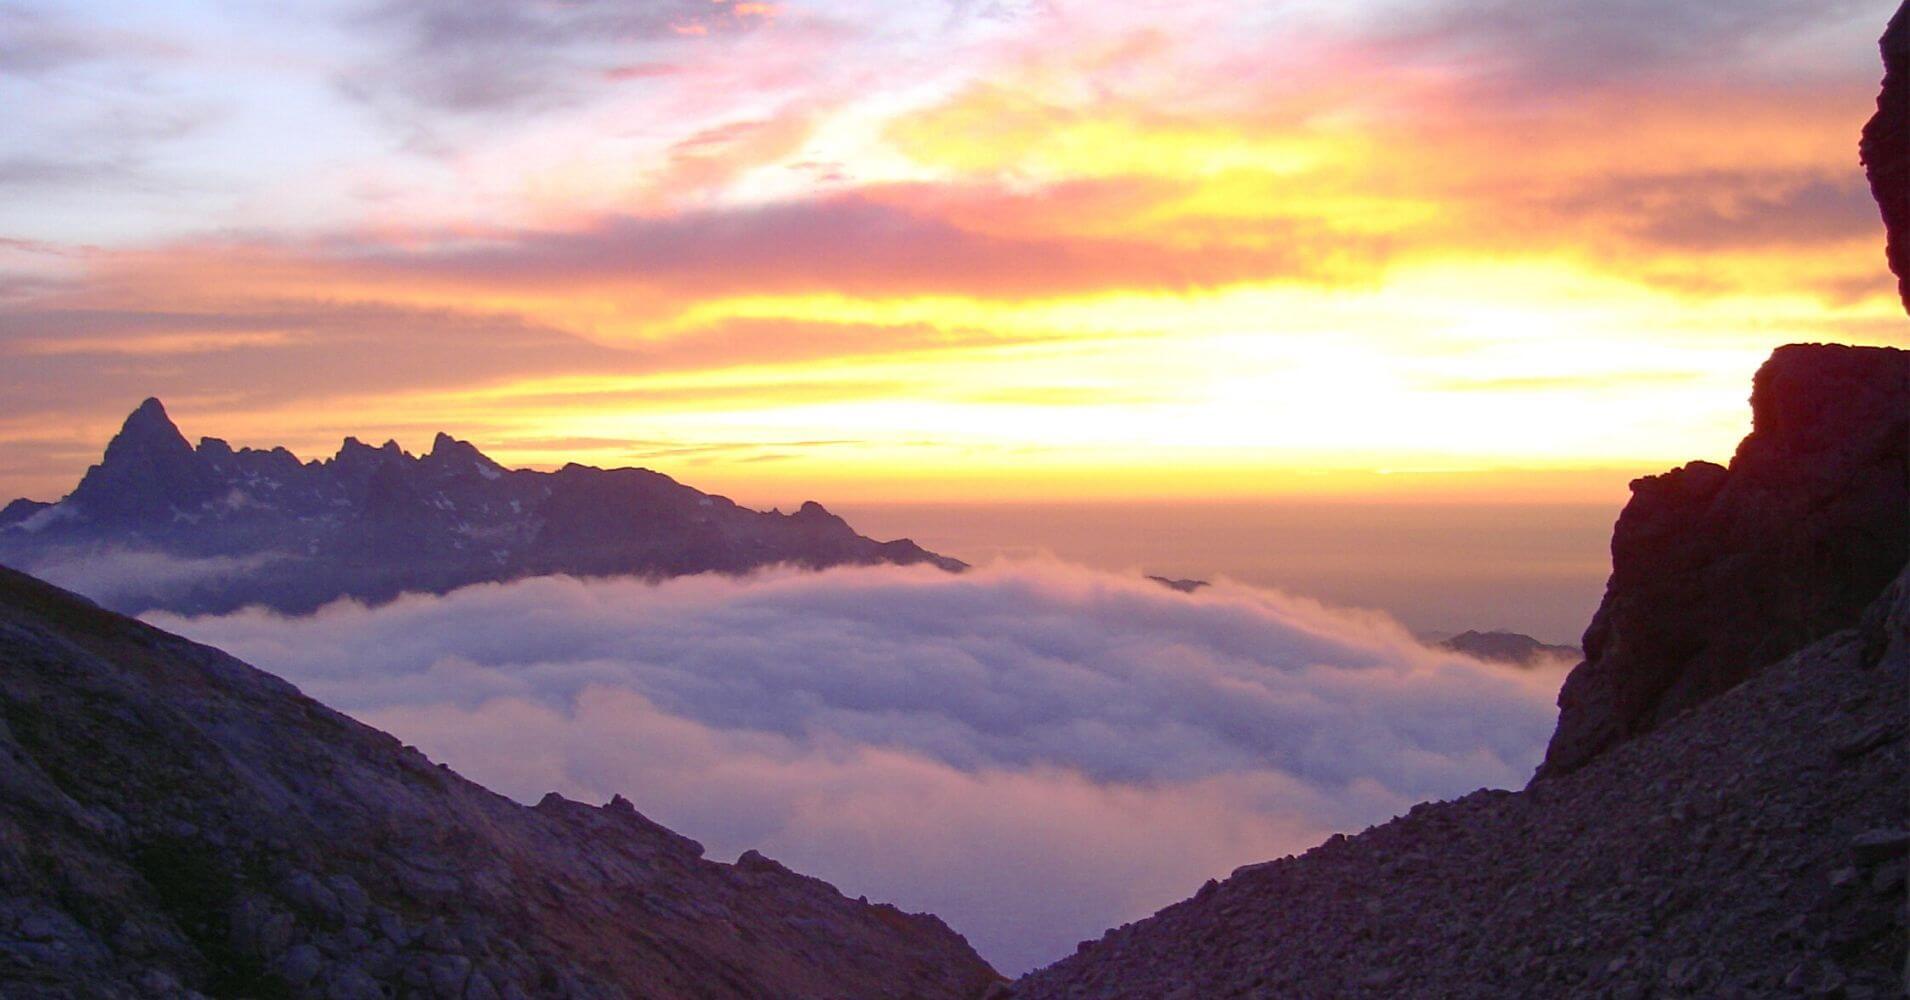 Empresas de Aventura de Asturias. Amanecer en Picos de Europa. Foto Tocando Cumbre.